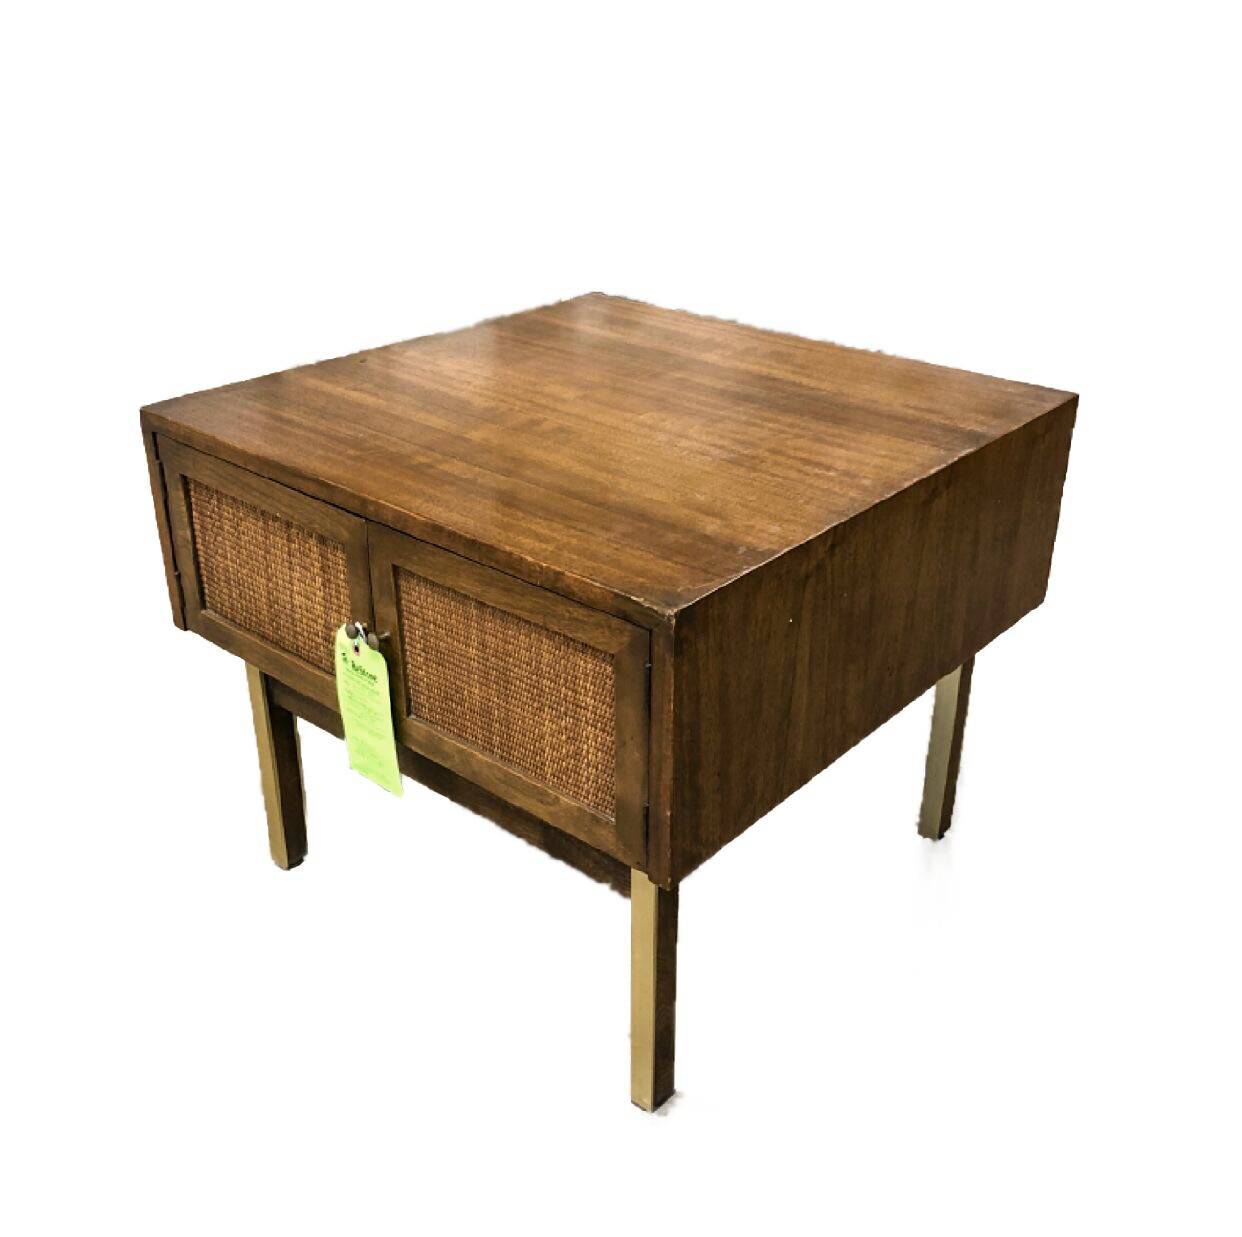 Mid-Century Modern Style Wood Veneer End Table